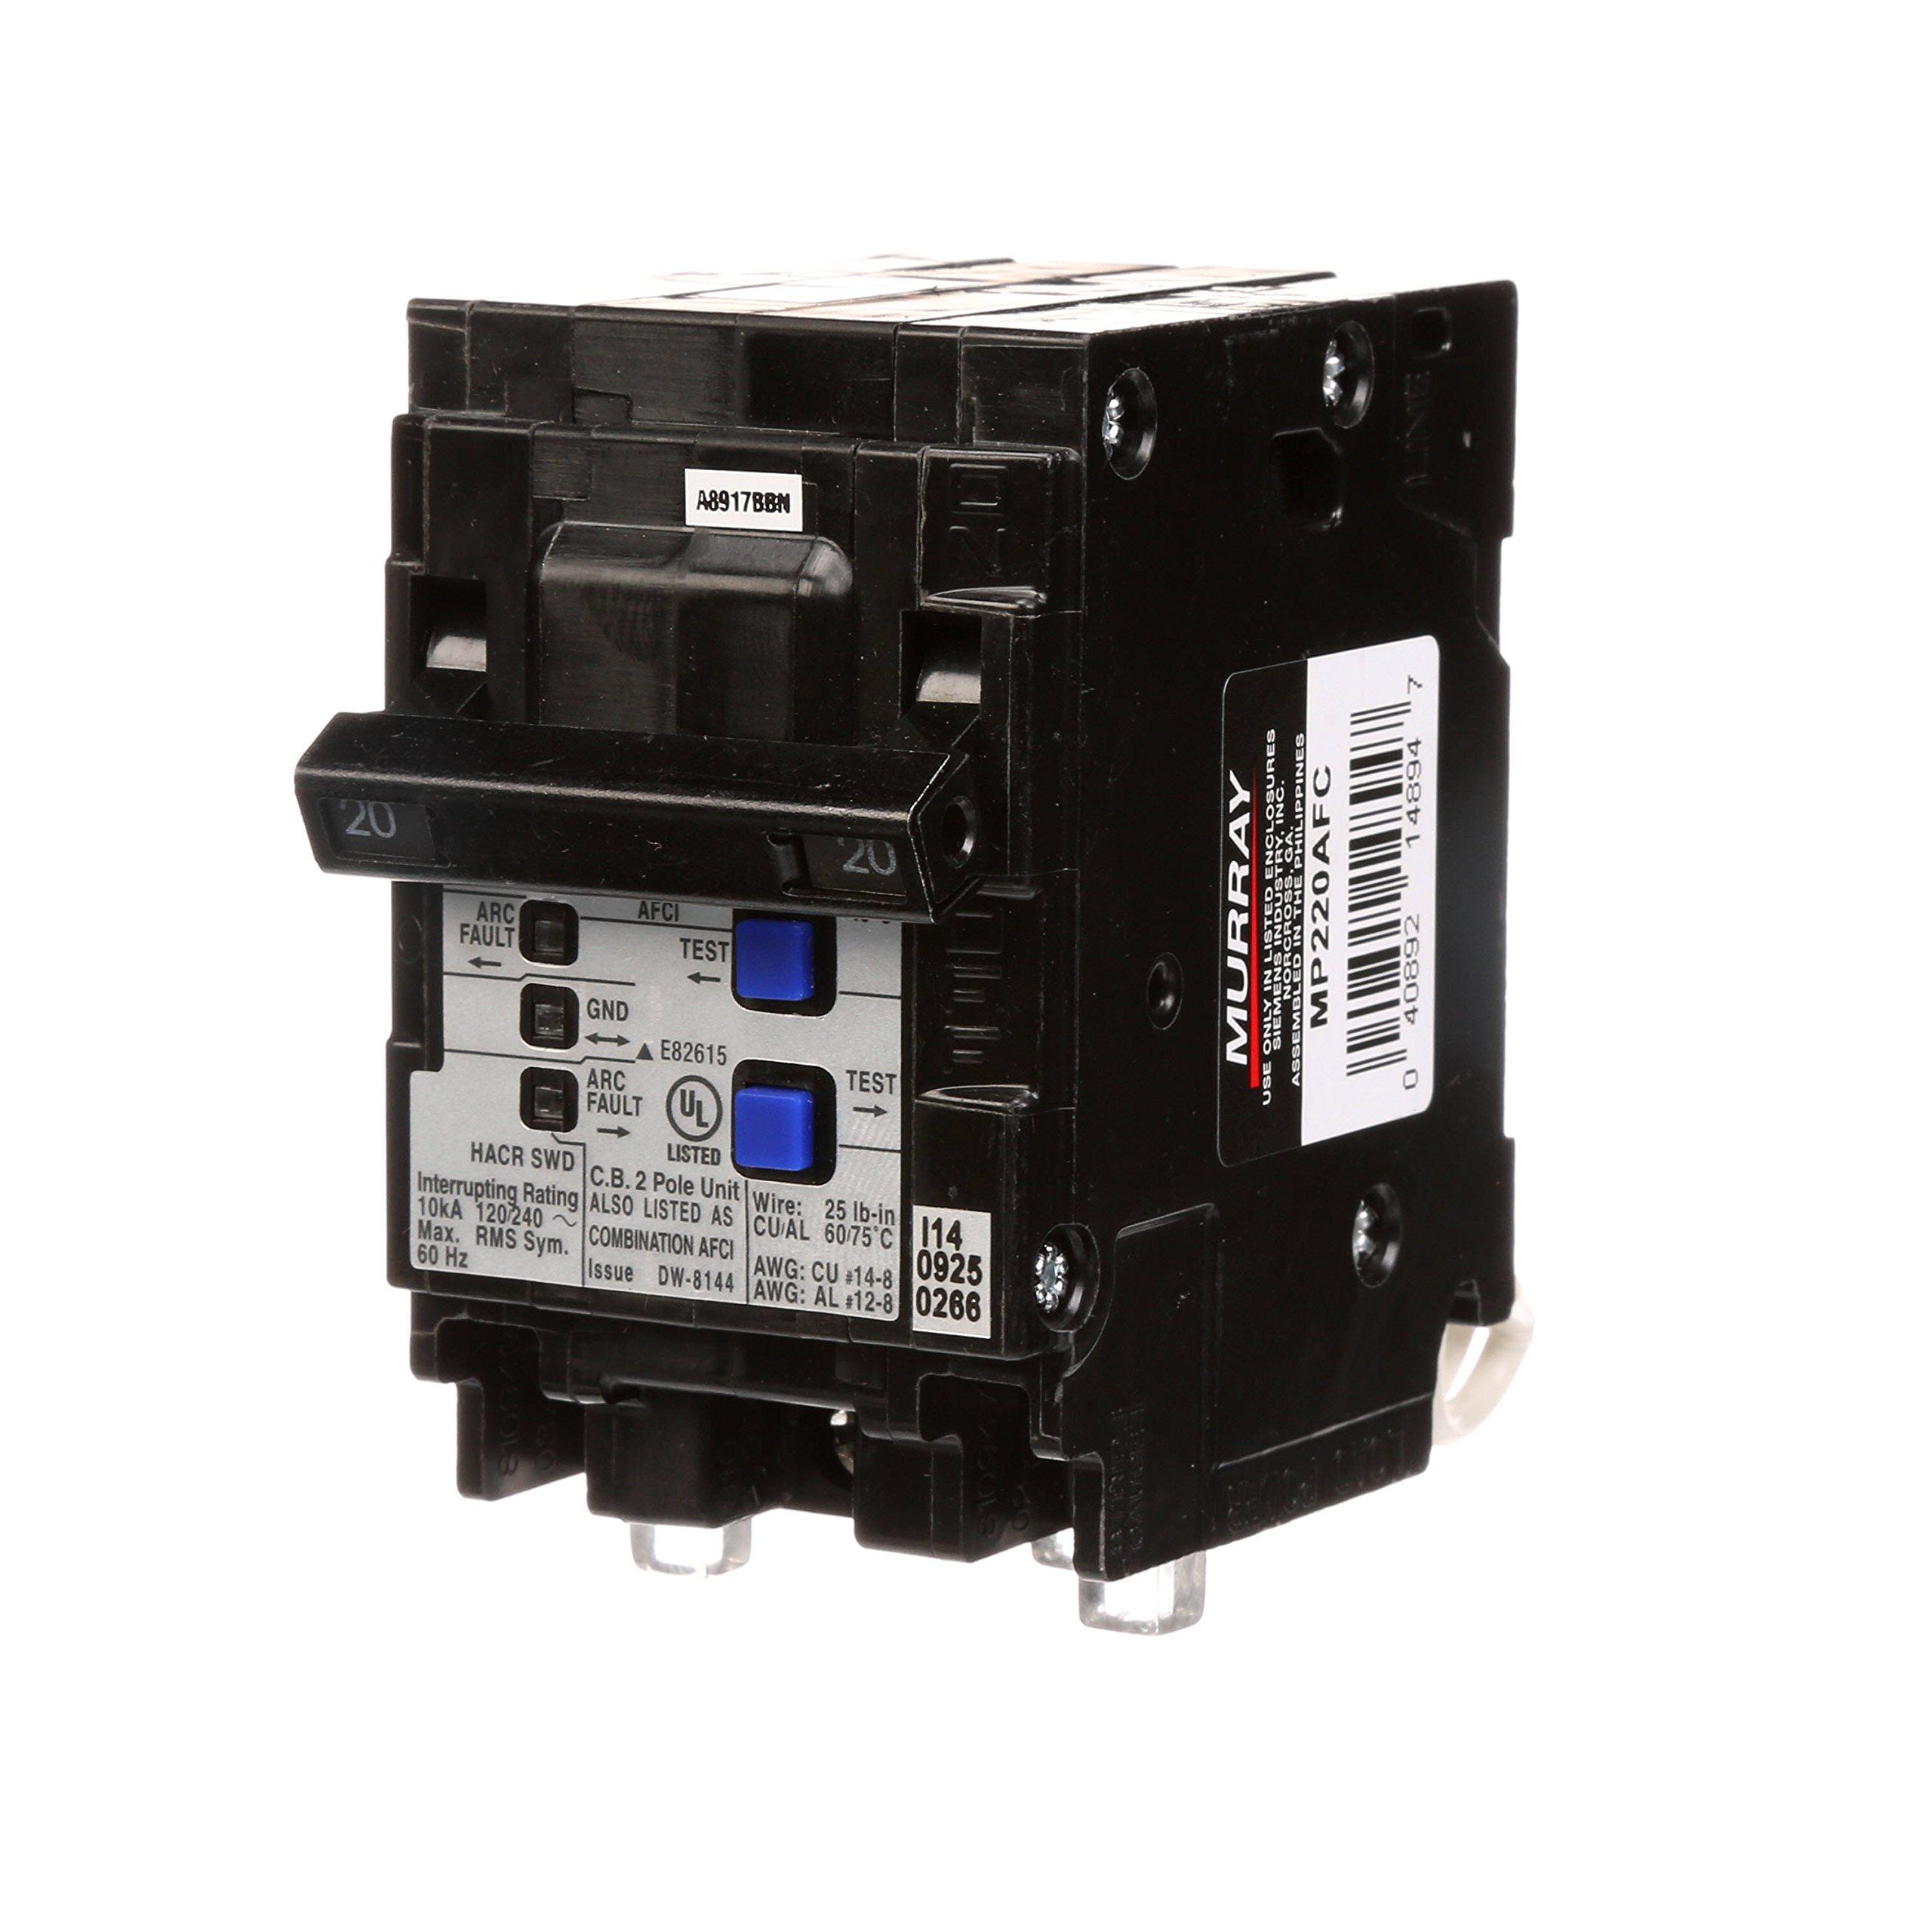 Murray MP220AFC 20-Amp 2 Pole 120-Volt Combination Type Arc Fault Circuit Interrupter